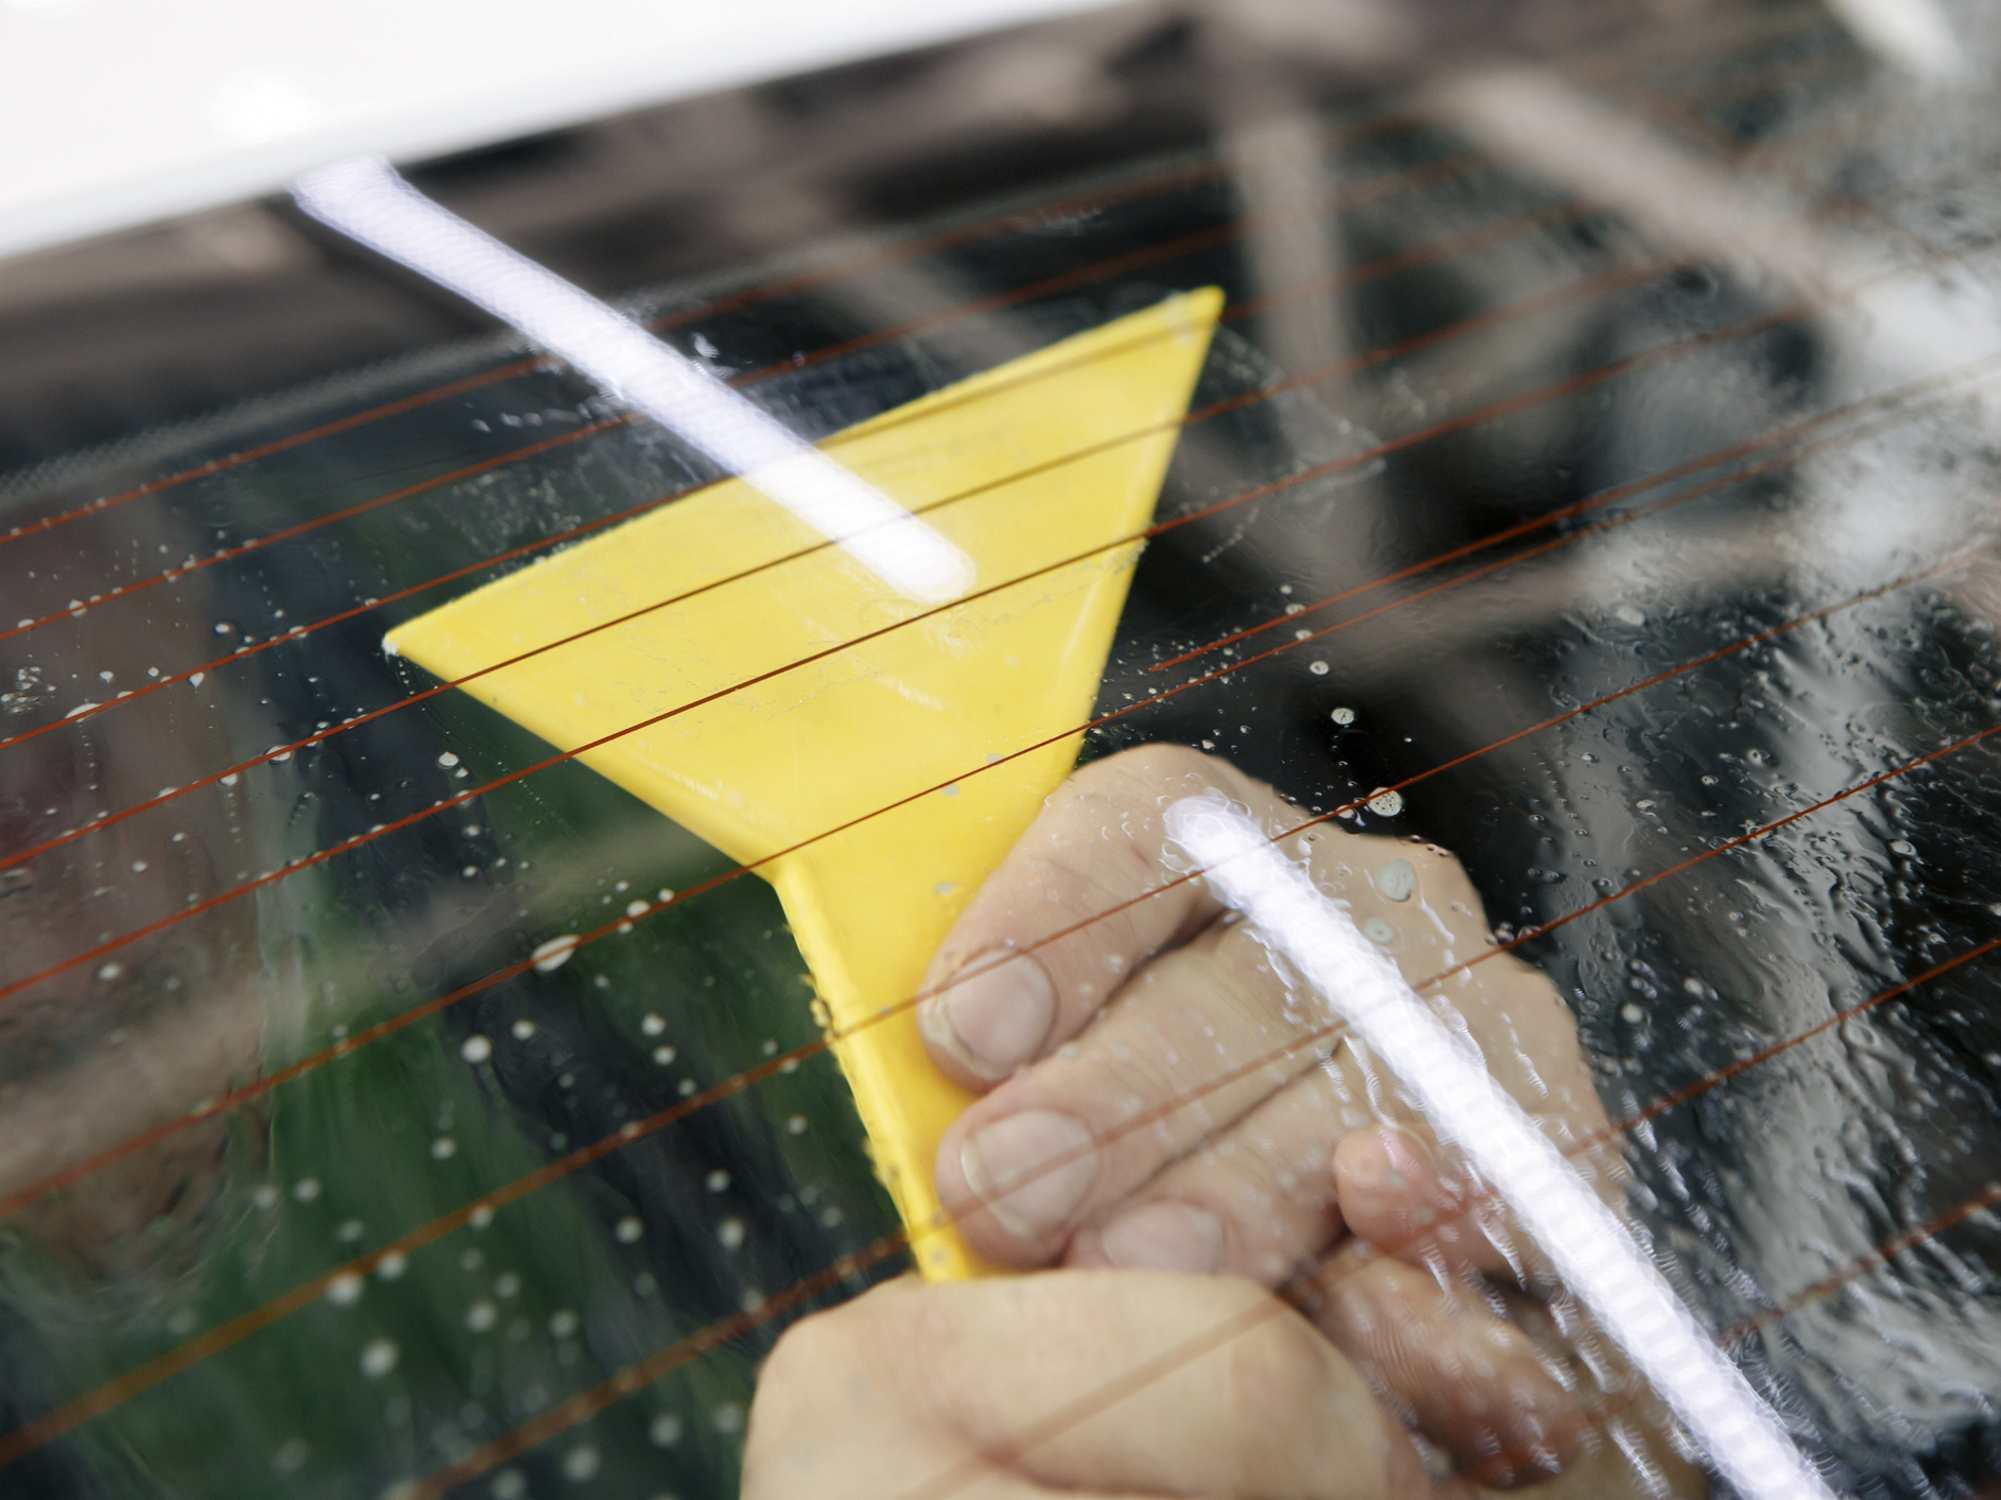 plastic scraper scraping window